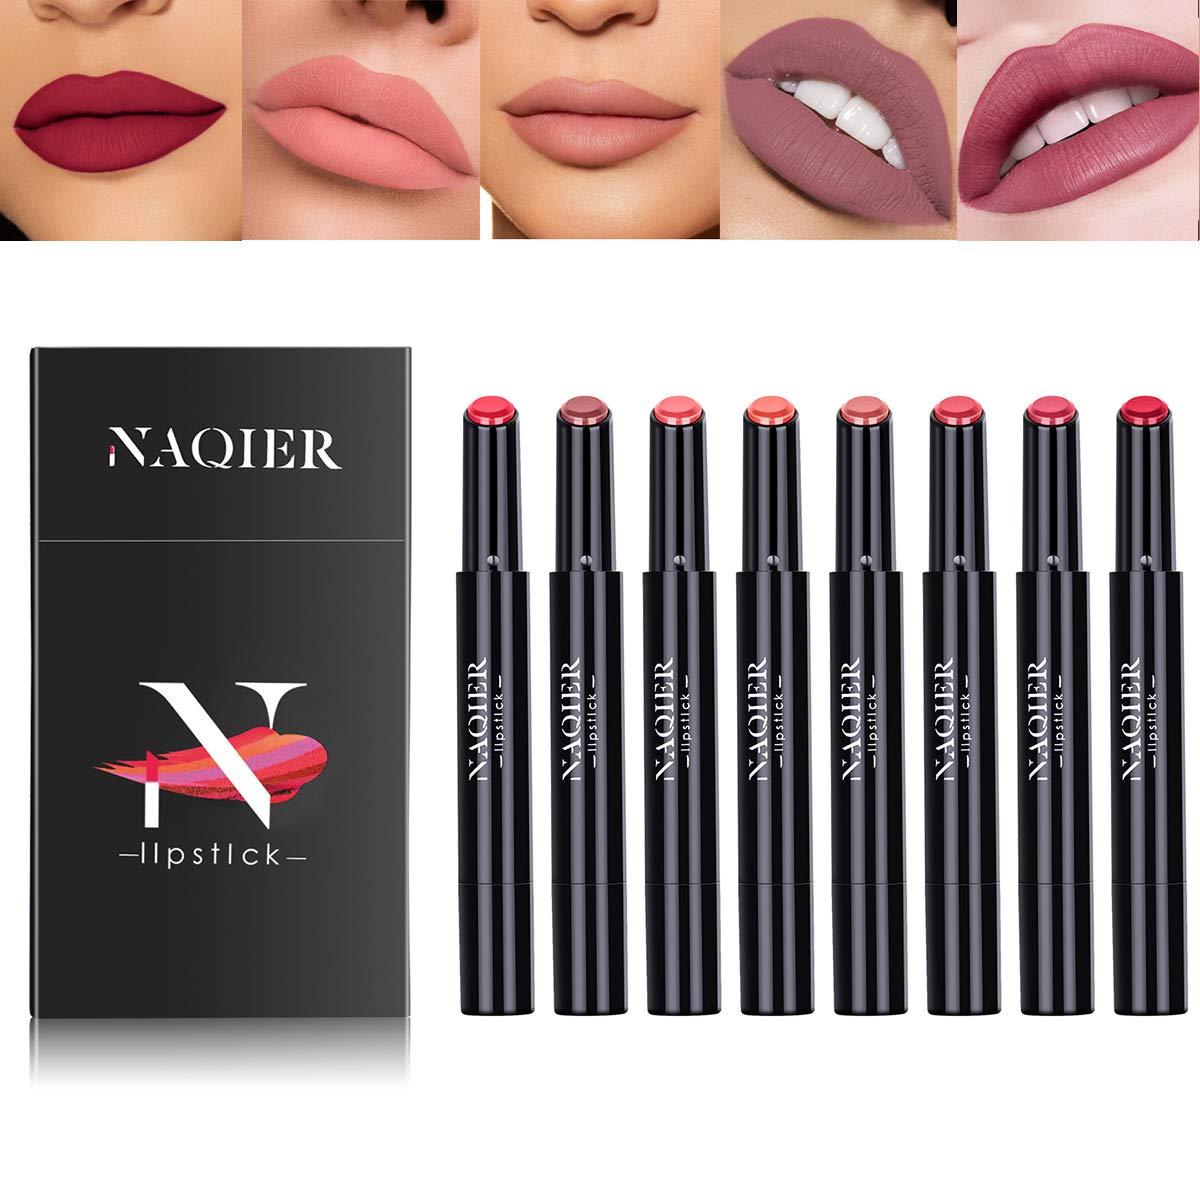 NAQIER Matte Lipstick Set, 8PCS Nude Moisturizer Smooth Lip Stick, Waterproof liquid lipstick mate Make up Velvet lip gloss Cosmetic by NAQIER (Image #1)